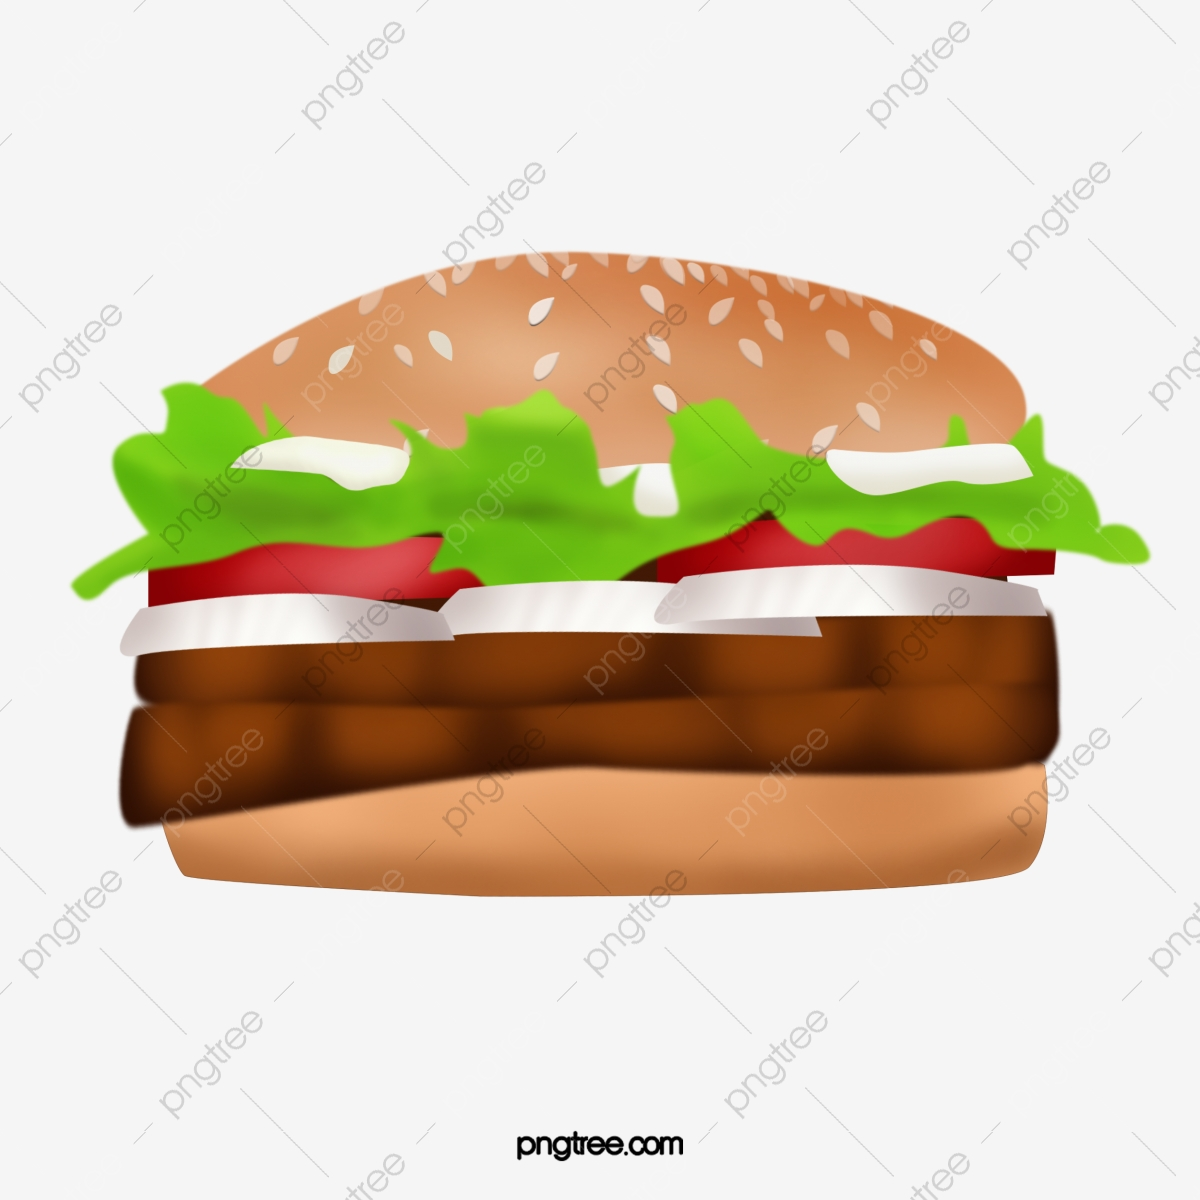 Double product kind hamburger. Burger clipart beef burger